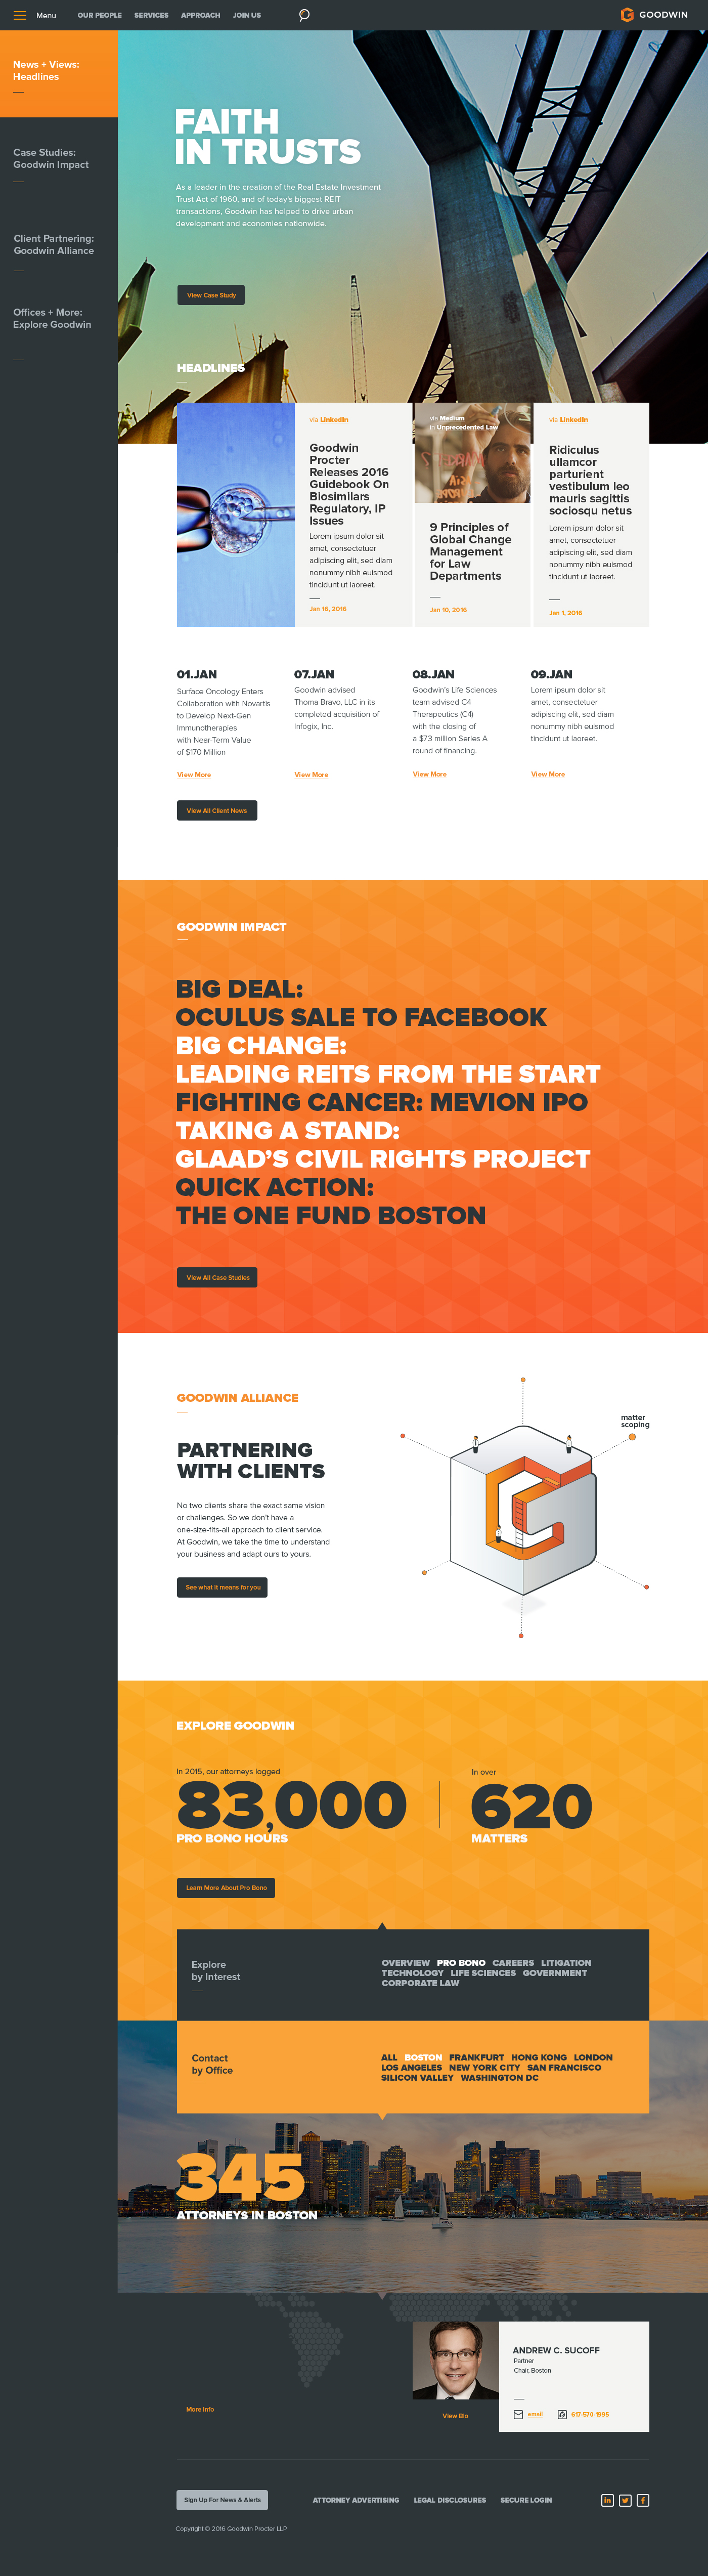 Goodwin Website image